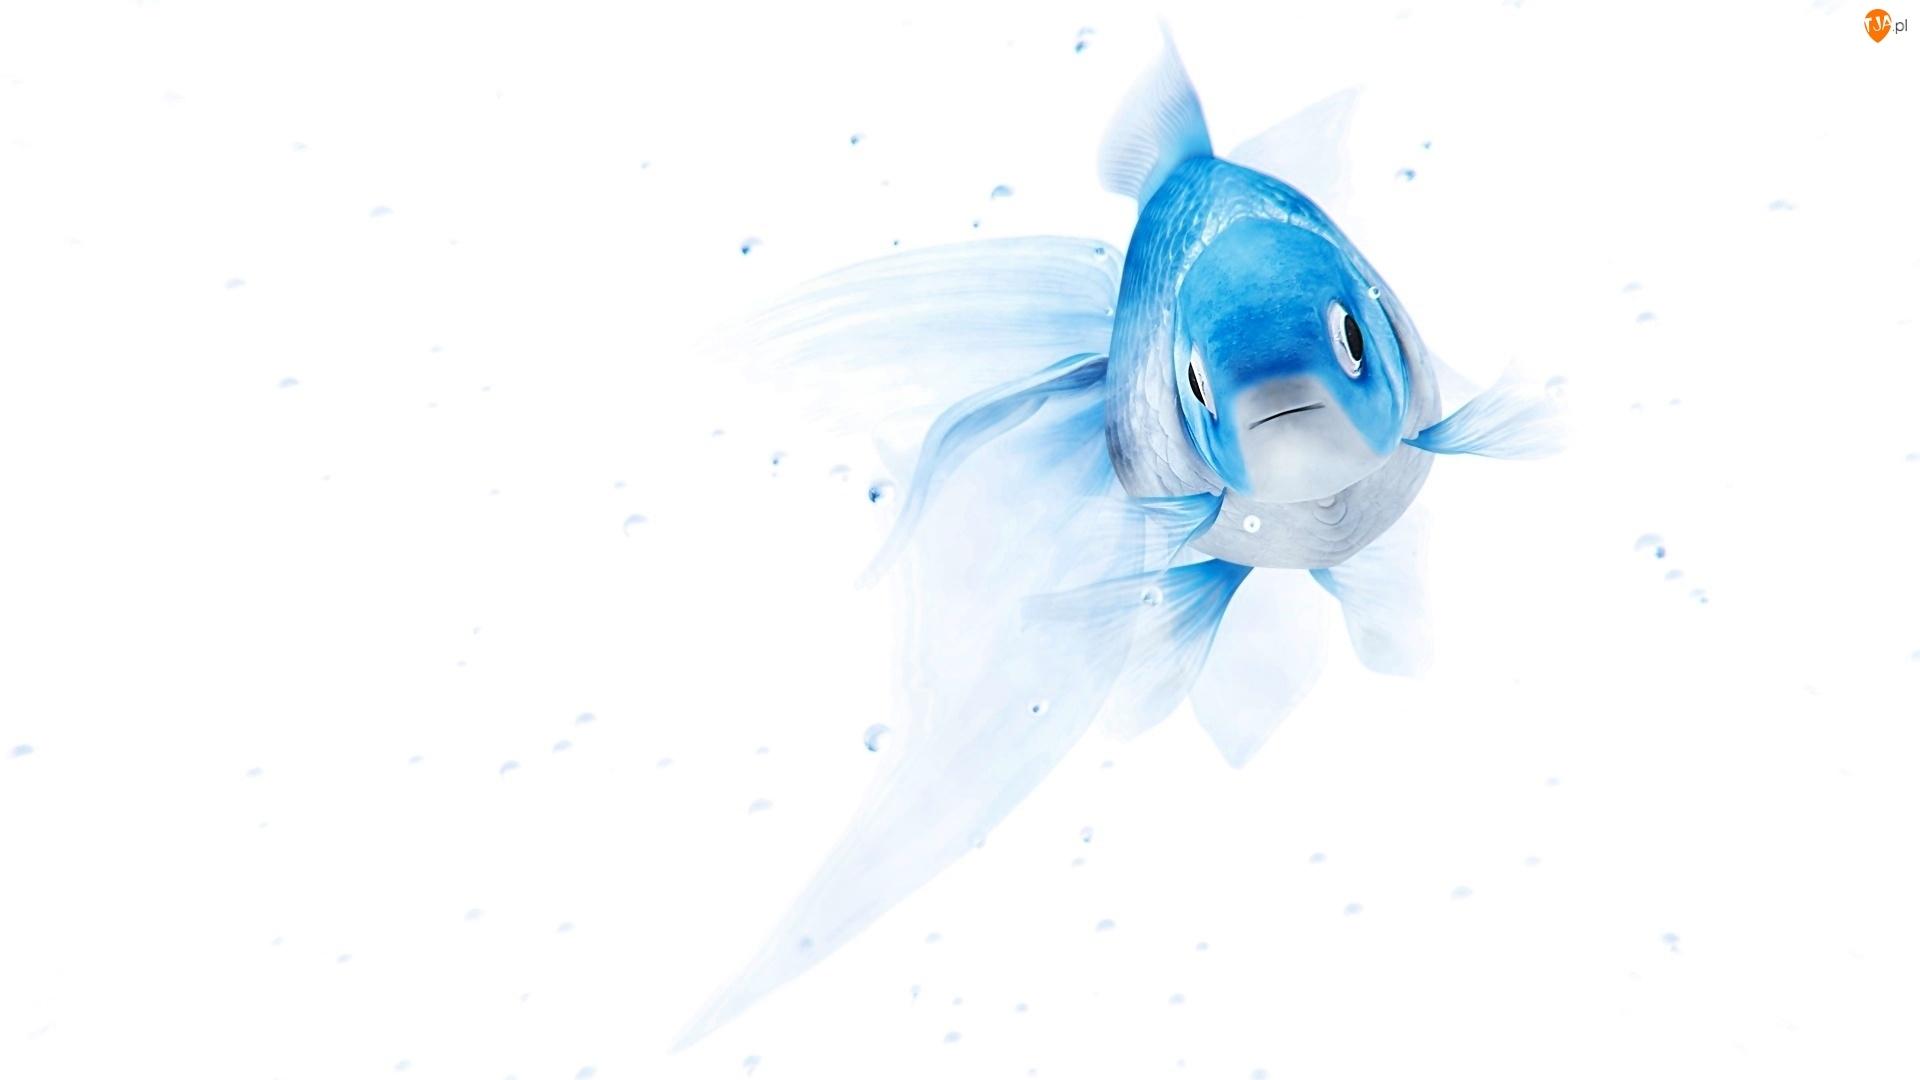 Grafika, Rybka, Niebieska, Ryba